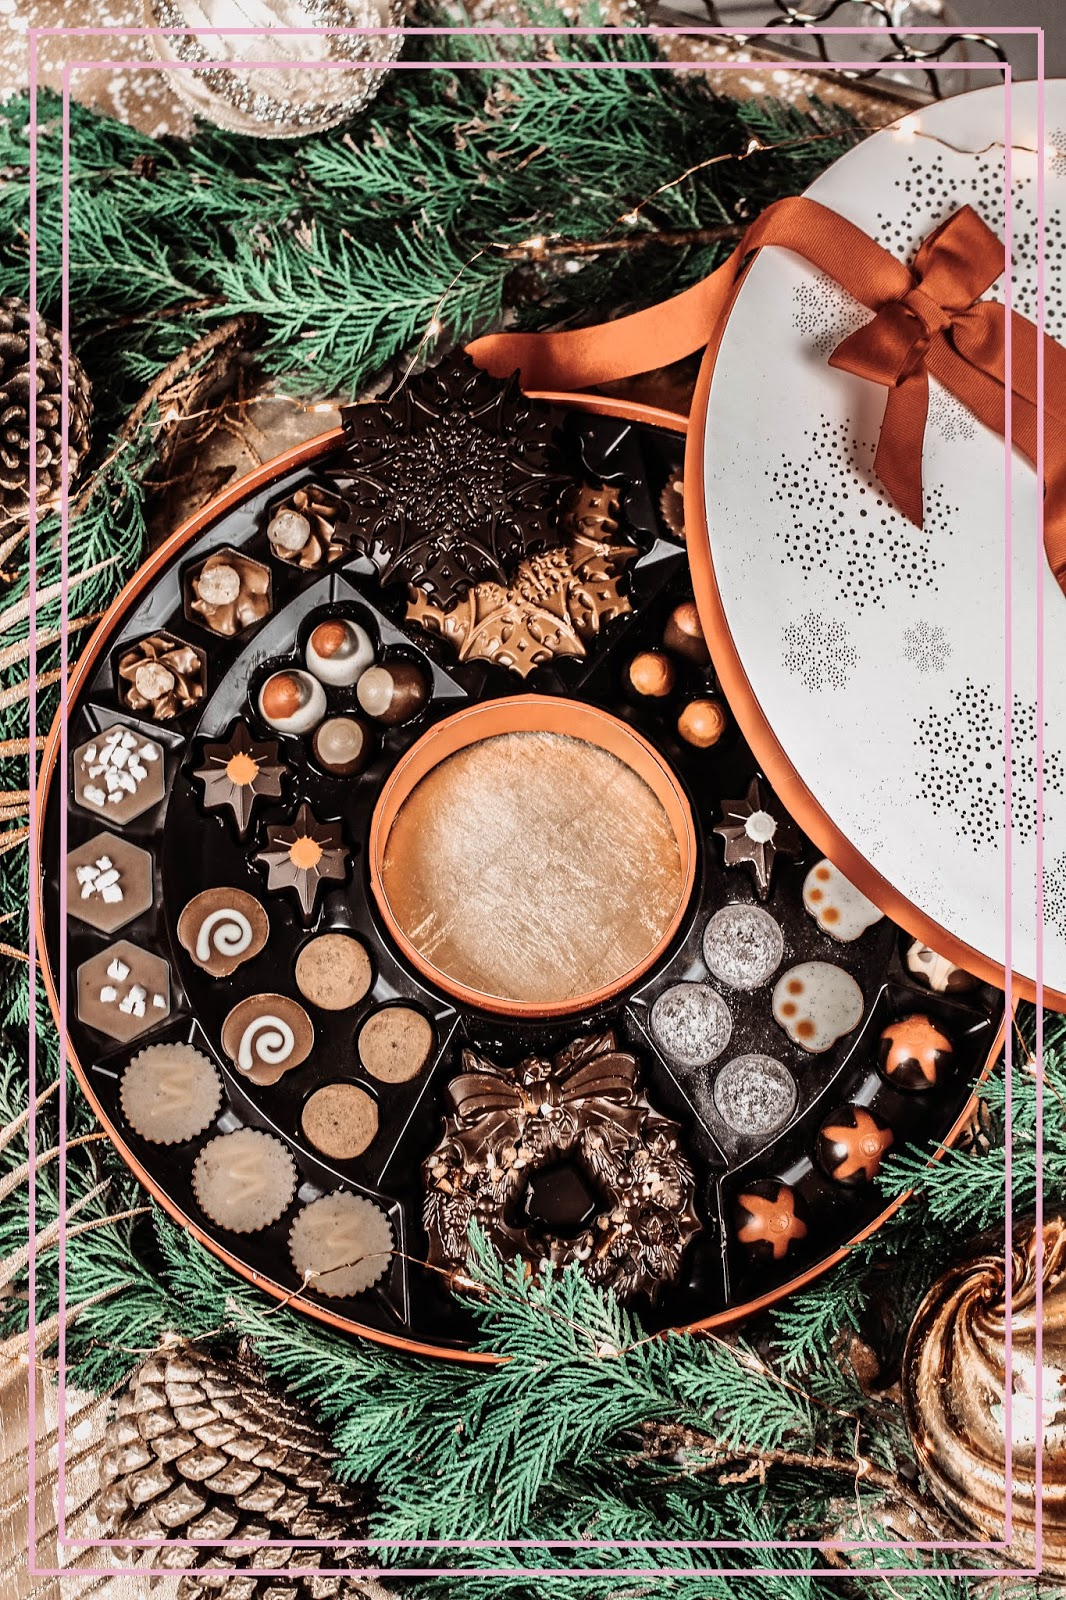 Hotel Chocolat Christmas Wreath Giveaway